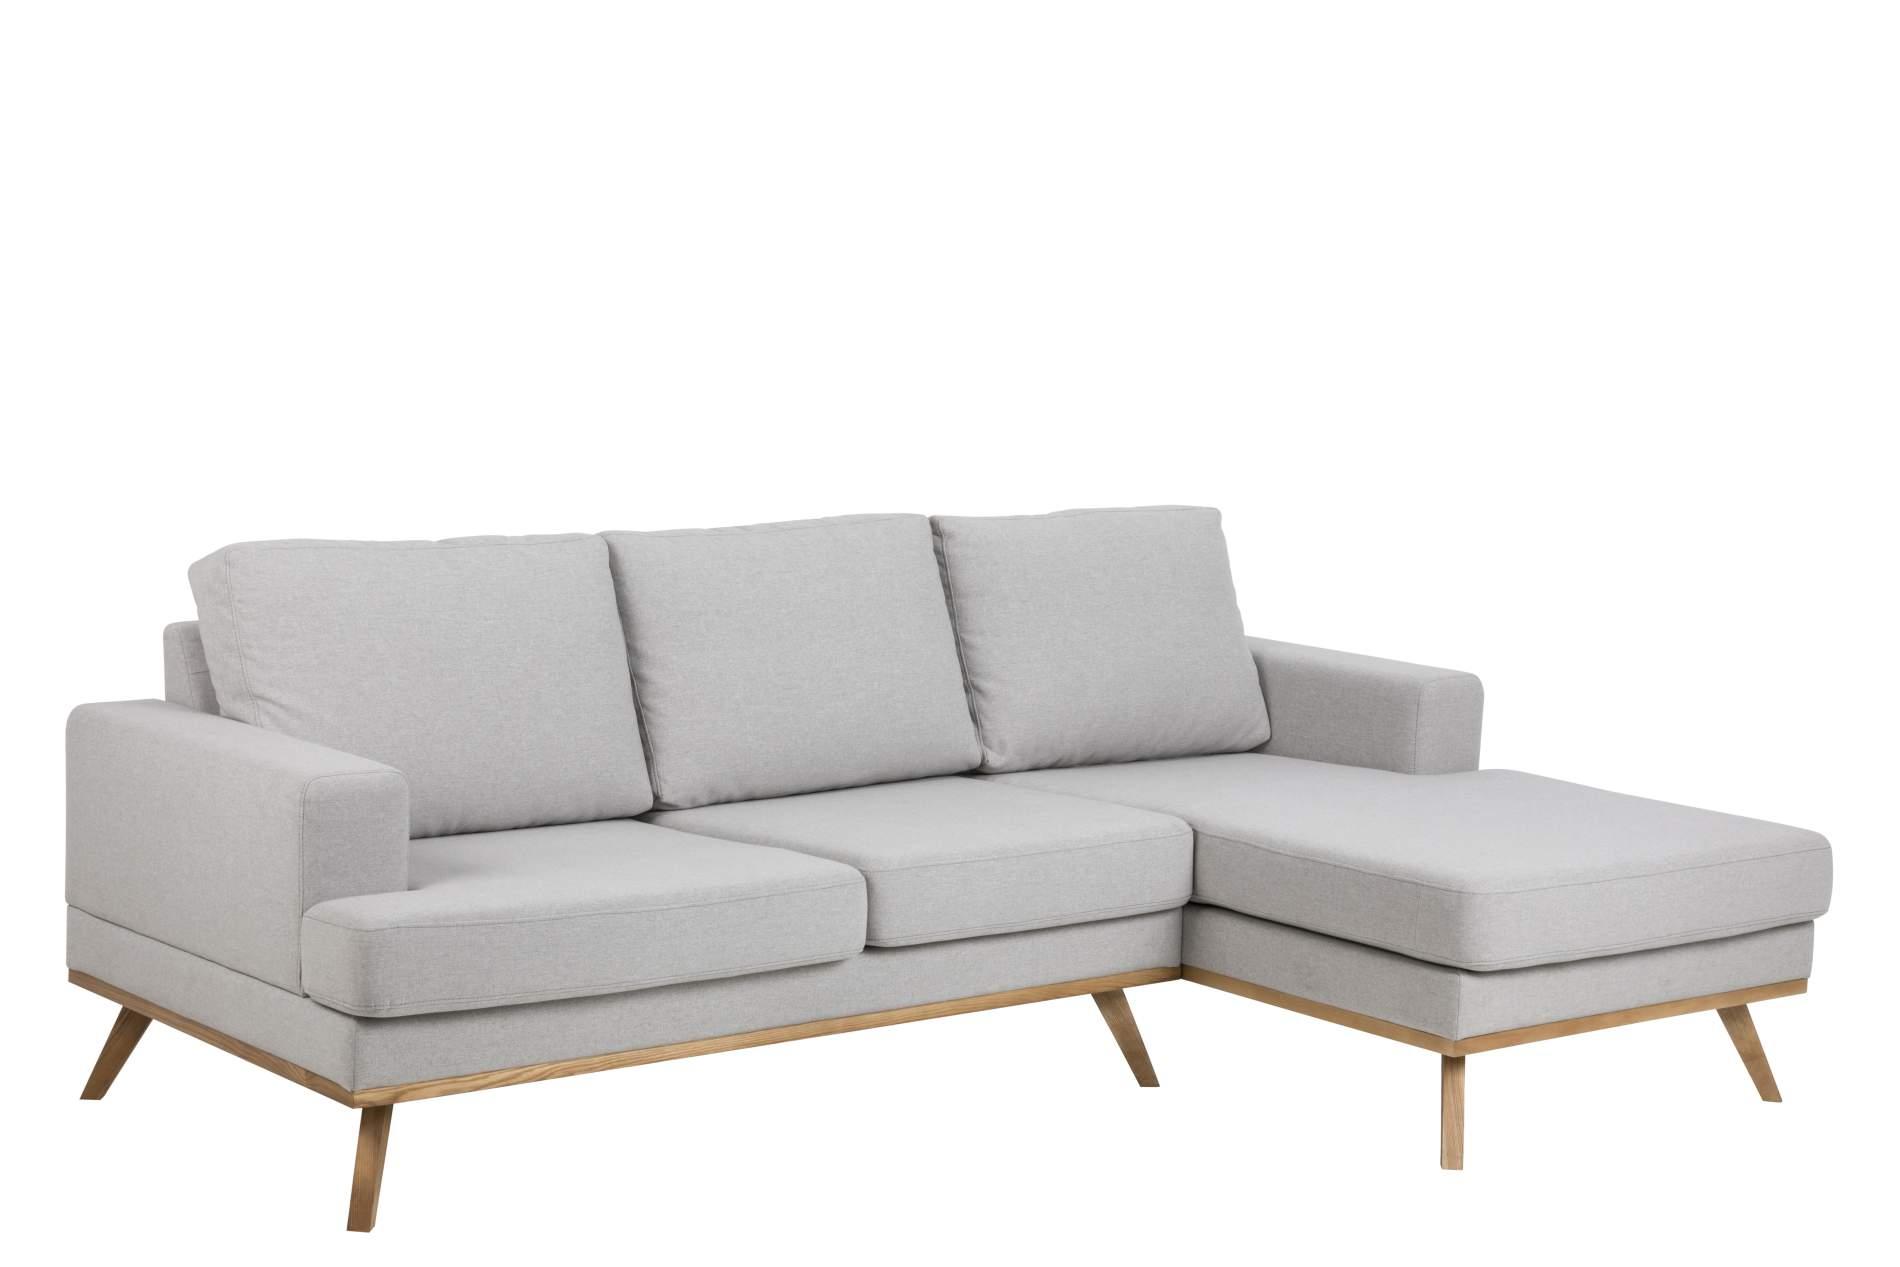 sofa norwich hellgrau mit chaiselongue rechts. Black Bedroom Furniture Sets. Home Design Ideas